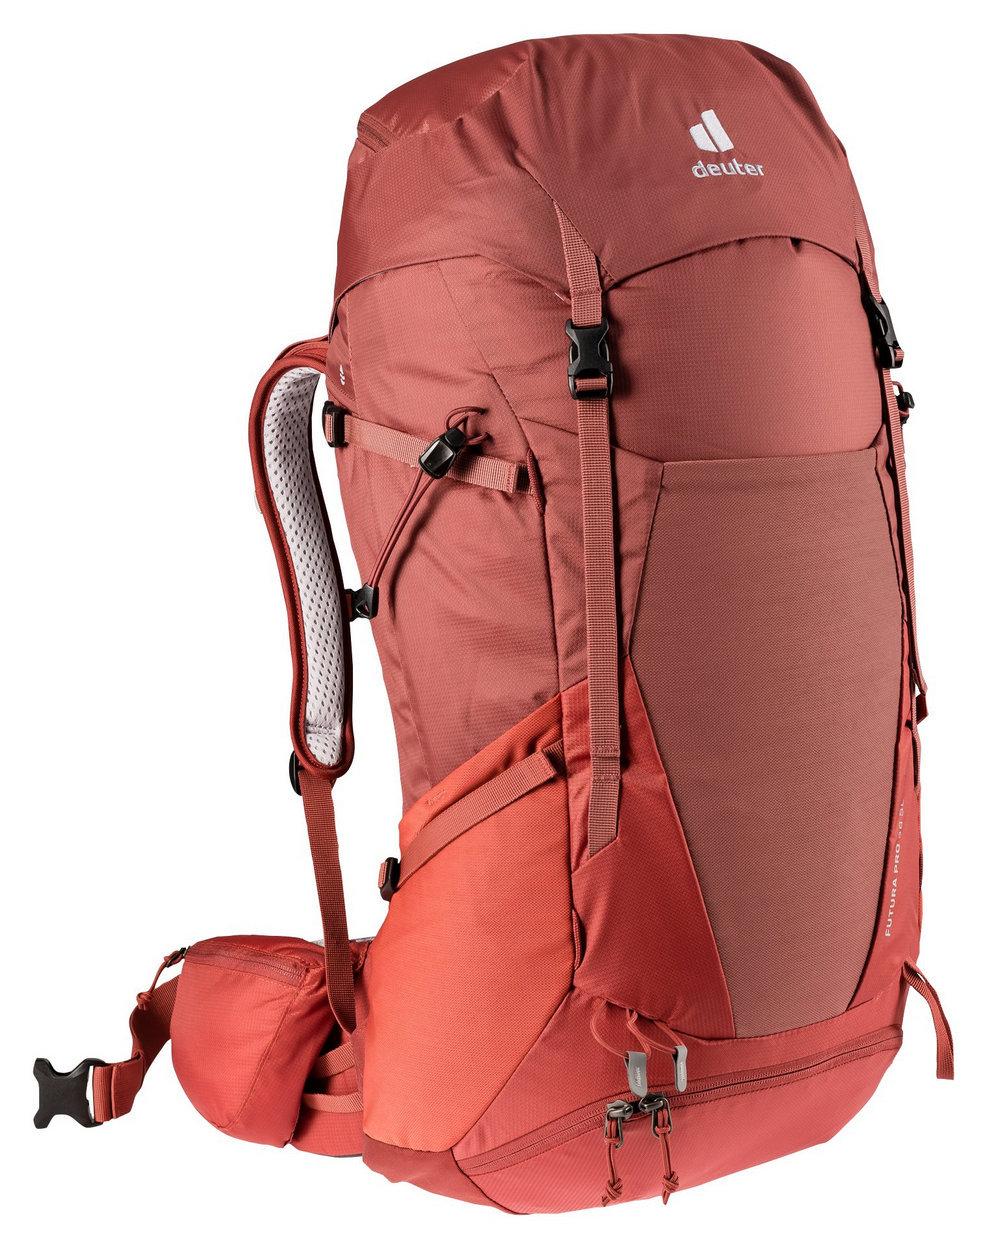 Туристические рюкзаки легкие Рюкзак Deuter Futura Pro 38 SL (2021) 3401221-5574-Futura_Pro_38_SL-d00.jpg